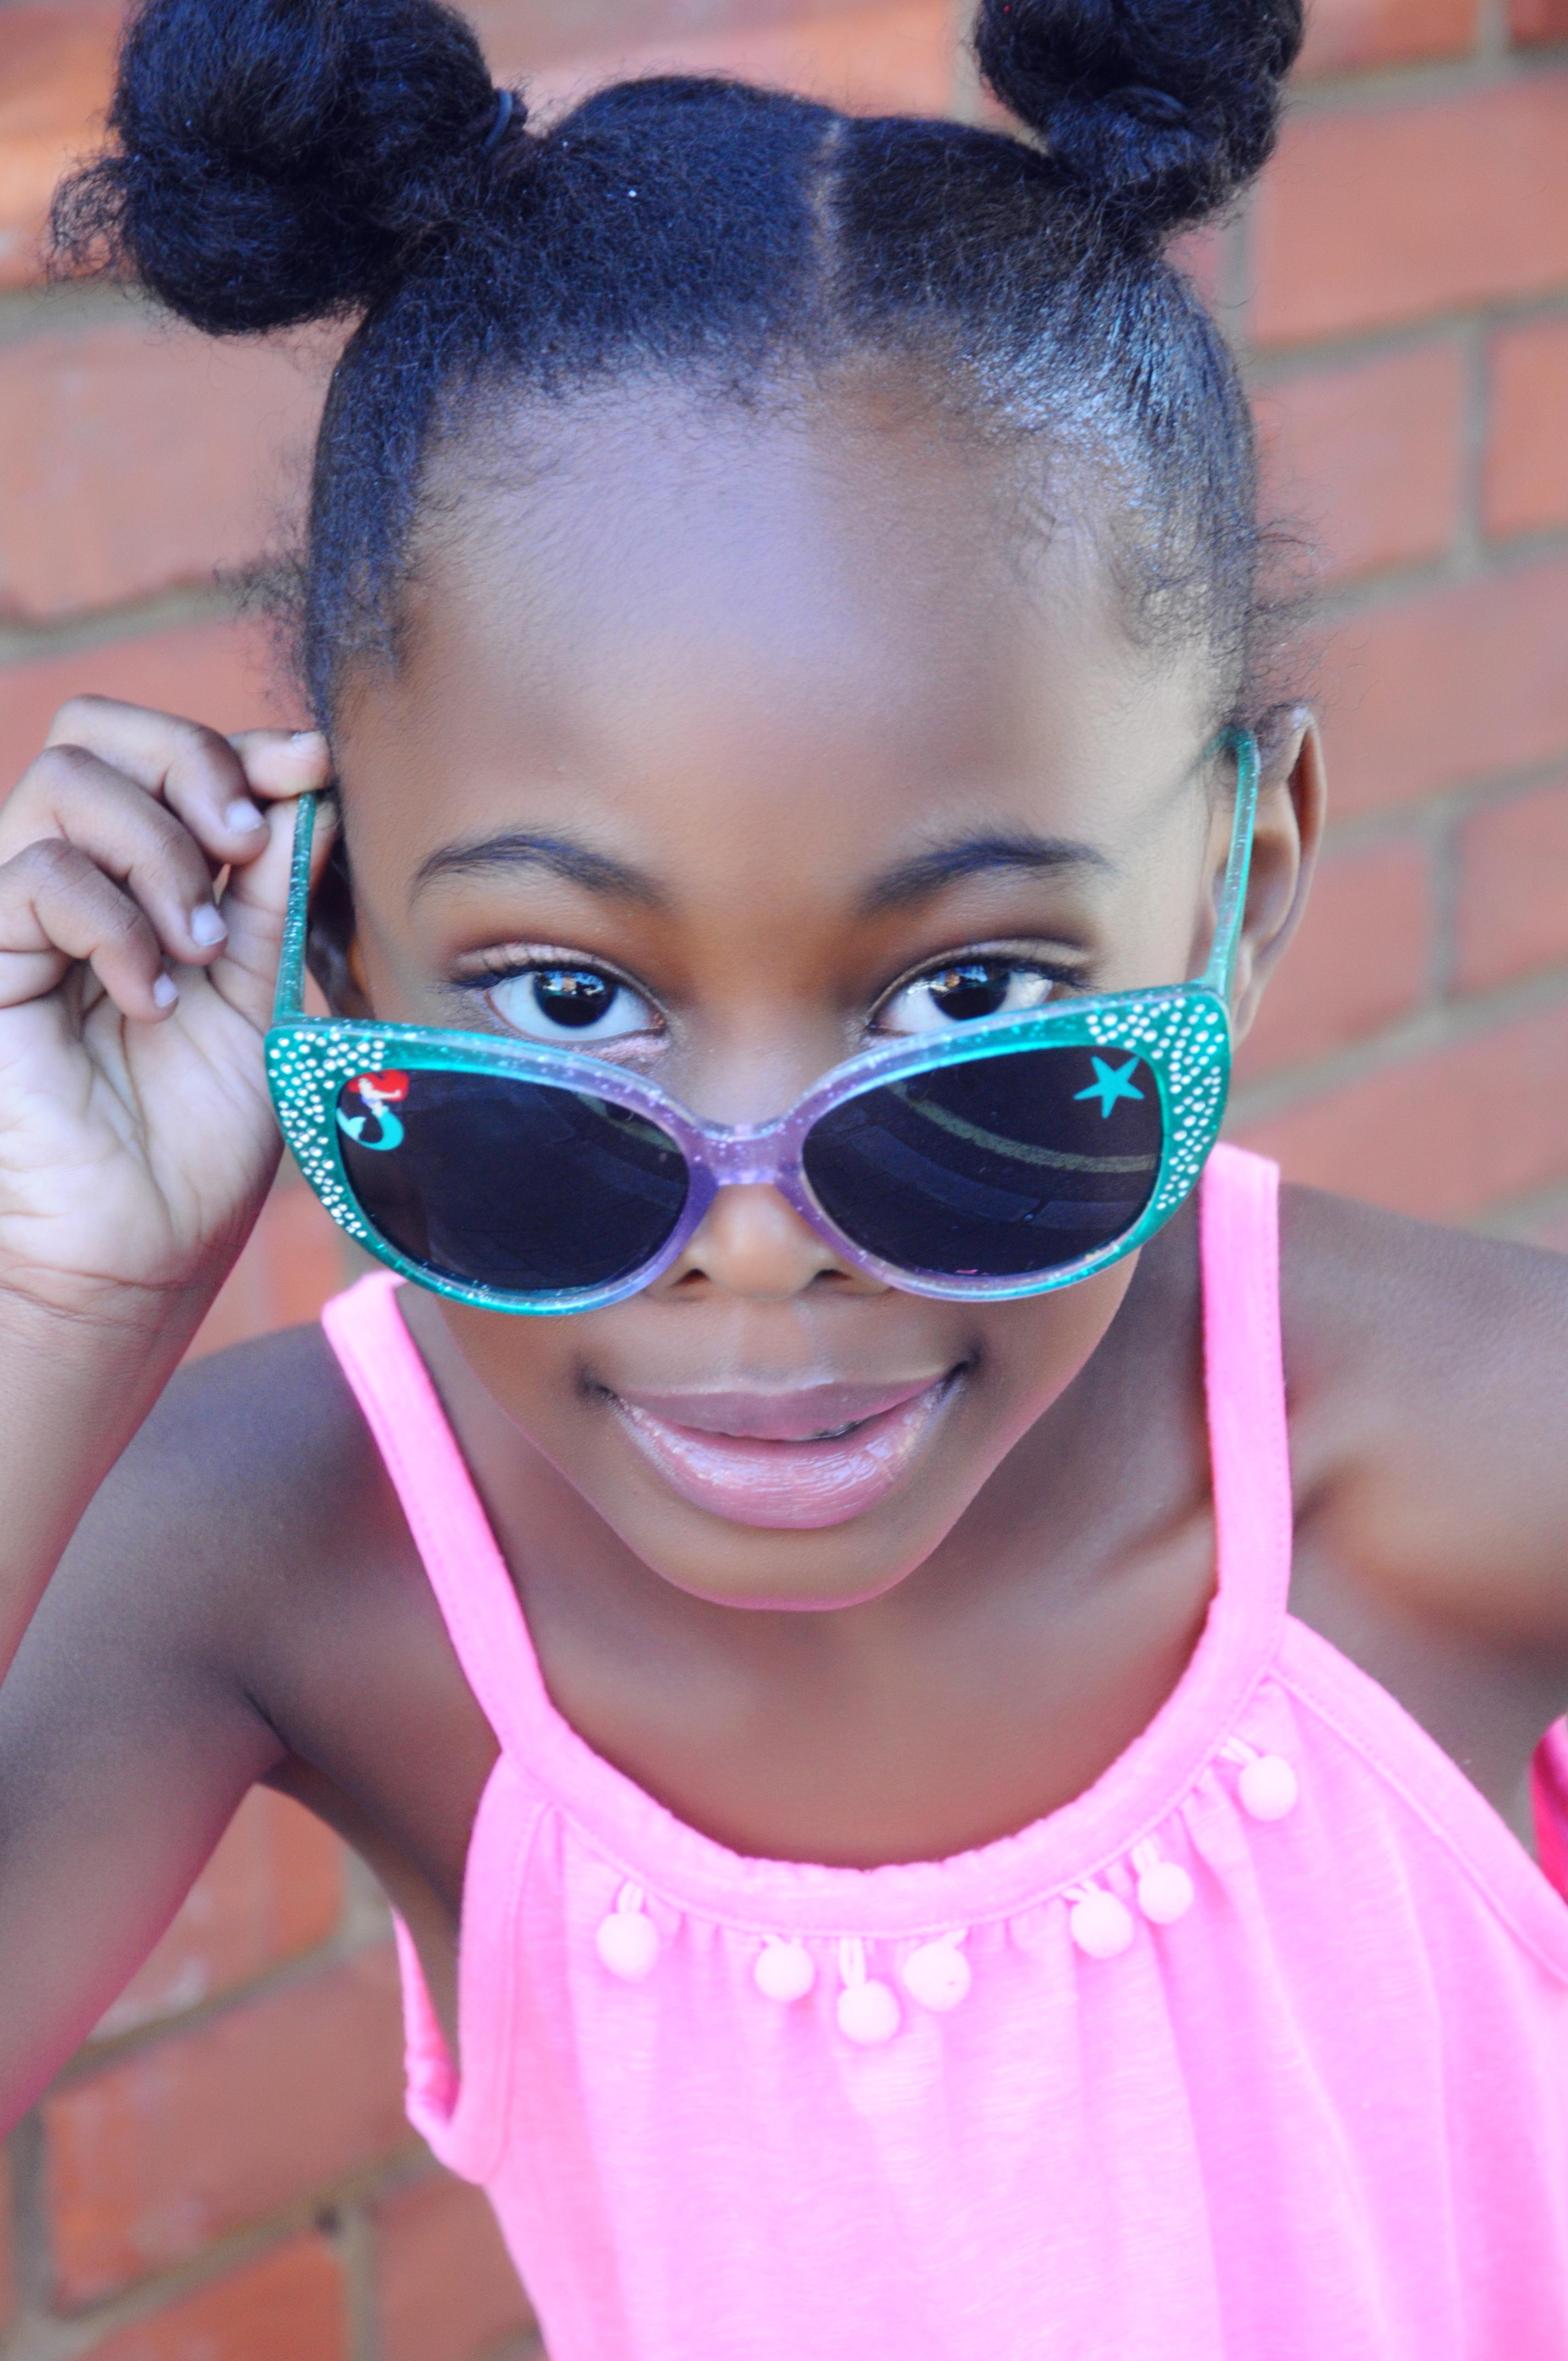 Head Shot Picture of Shekayla  Whyte